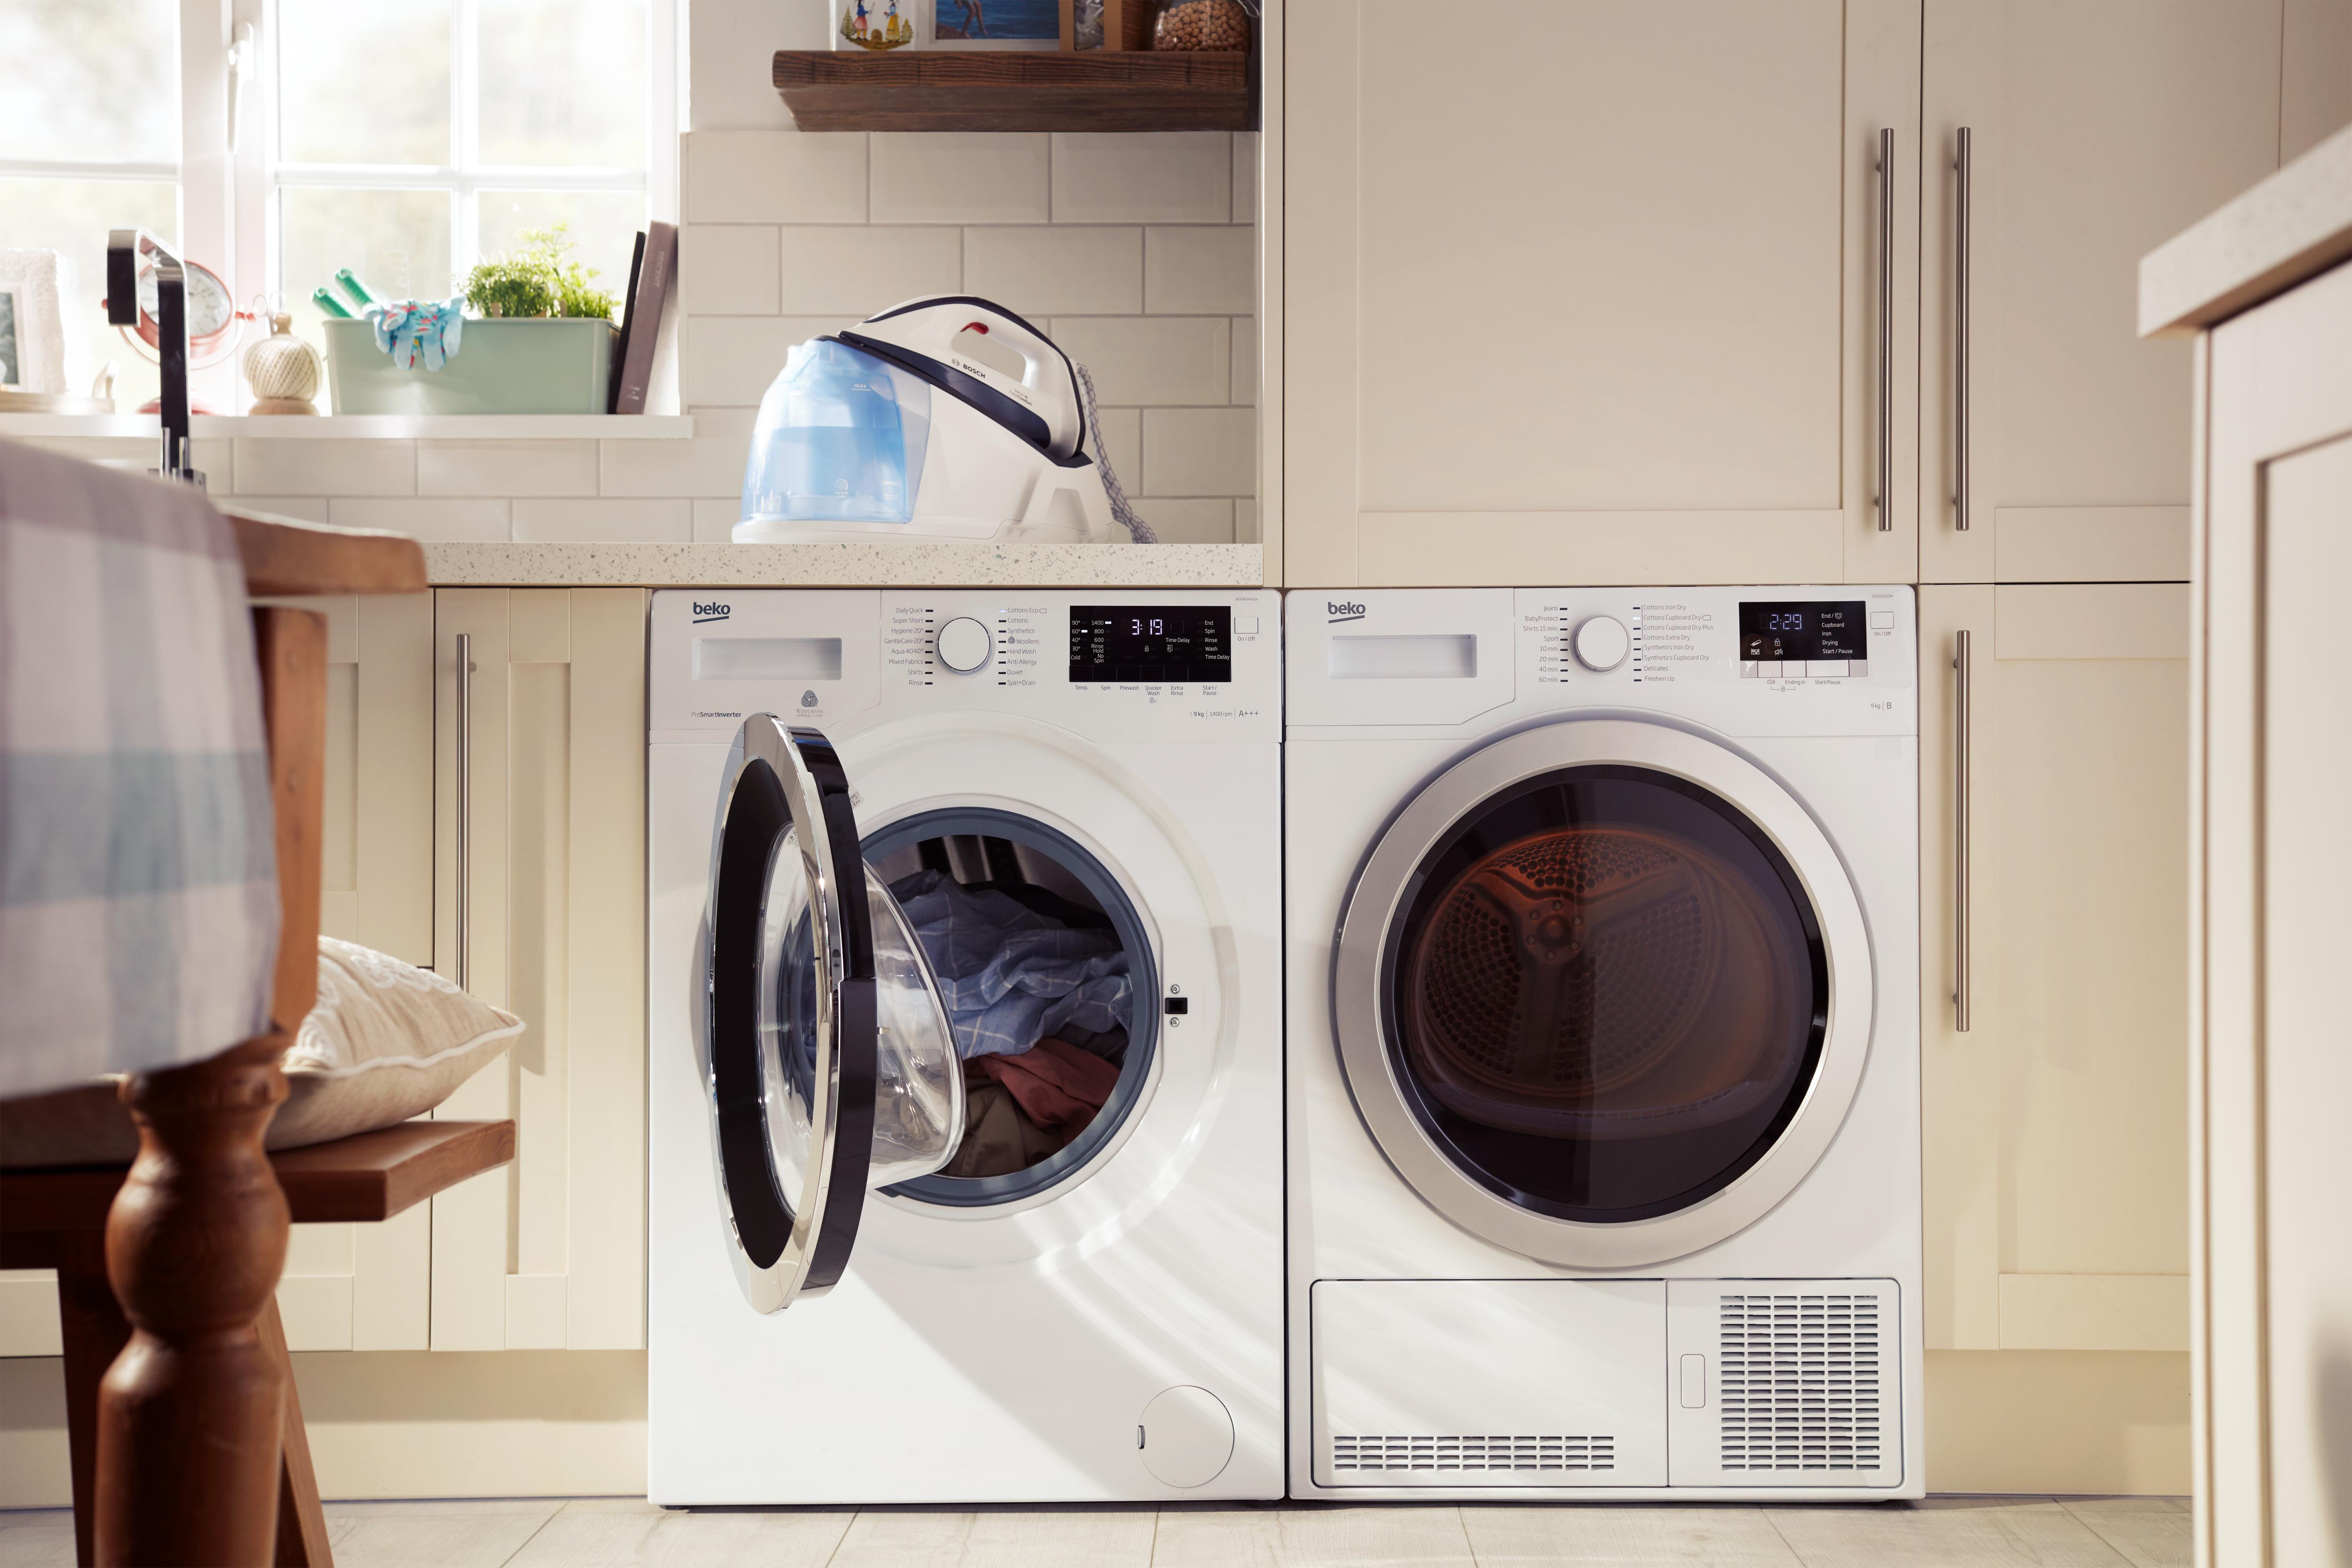 Tip Mudah Cuci Mesin Basuh